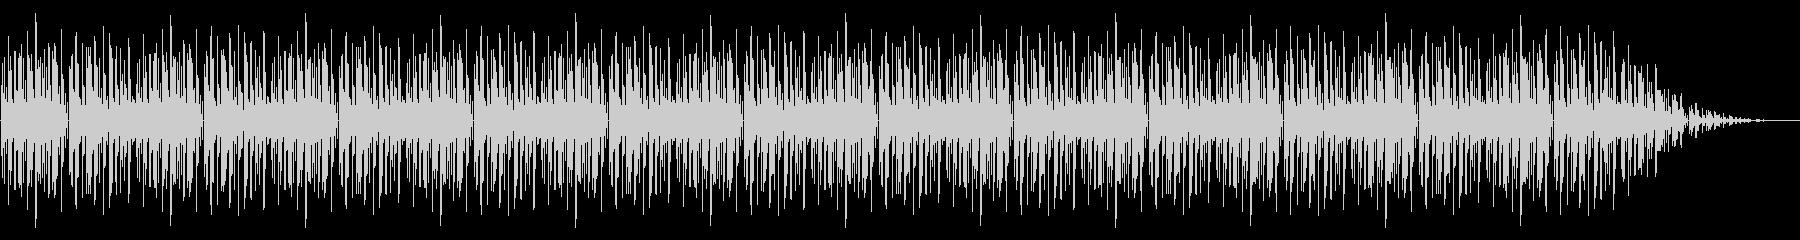 GB風パズル・カードゲームのリザルト曲の未再生の波形